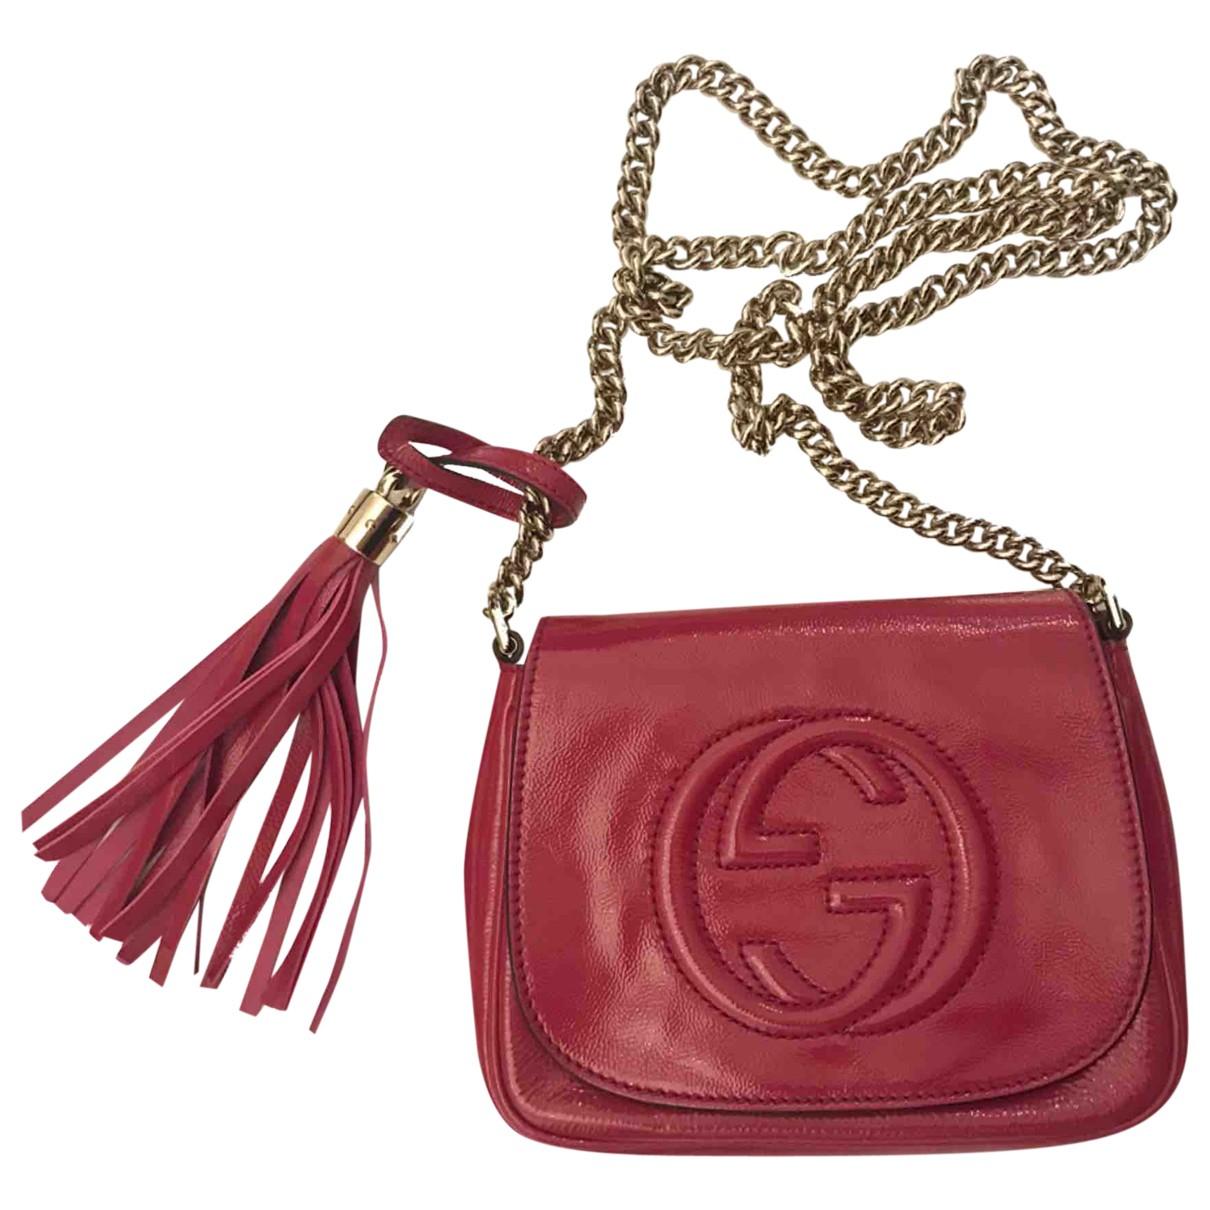 Gucci Soho Pink Patent leather handbag for Women \N